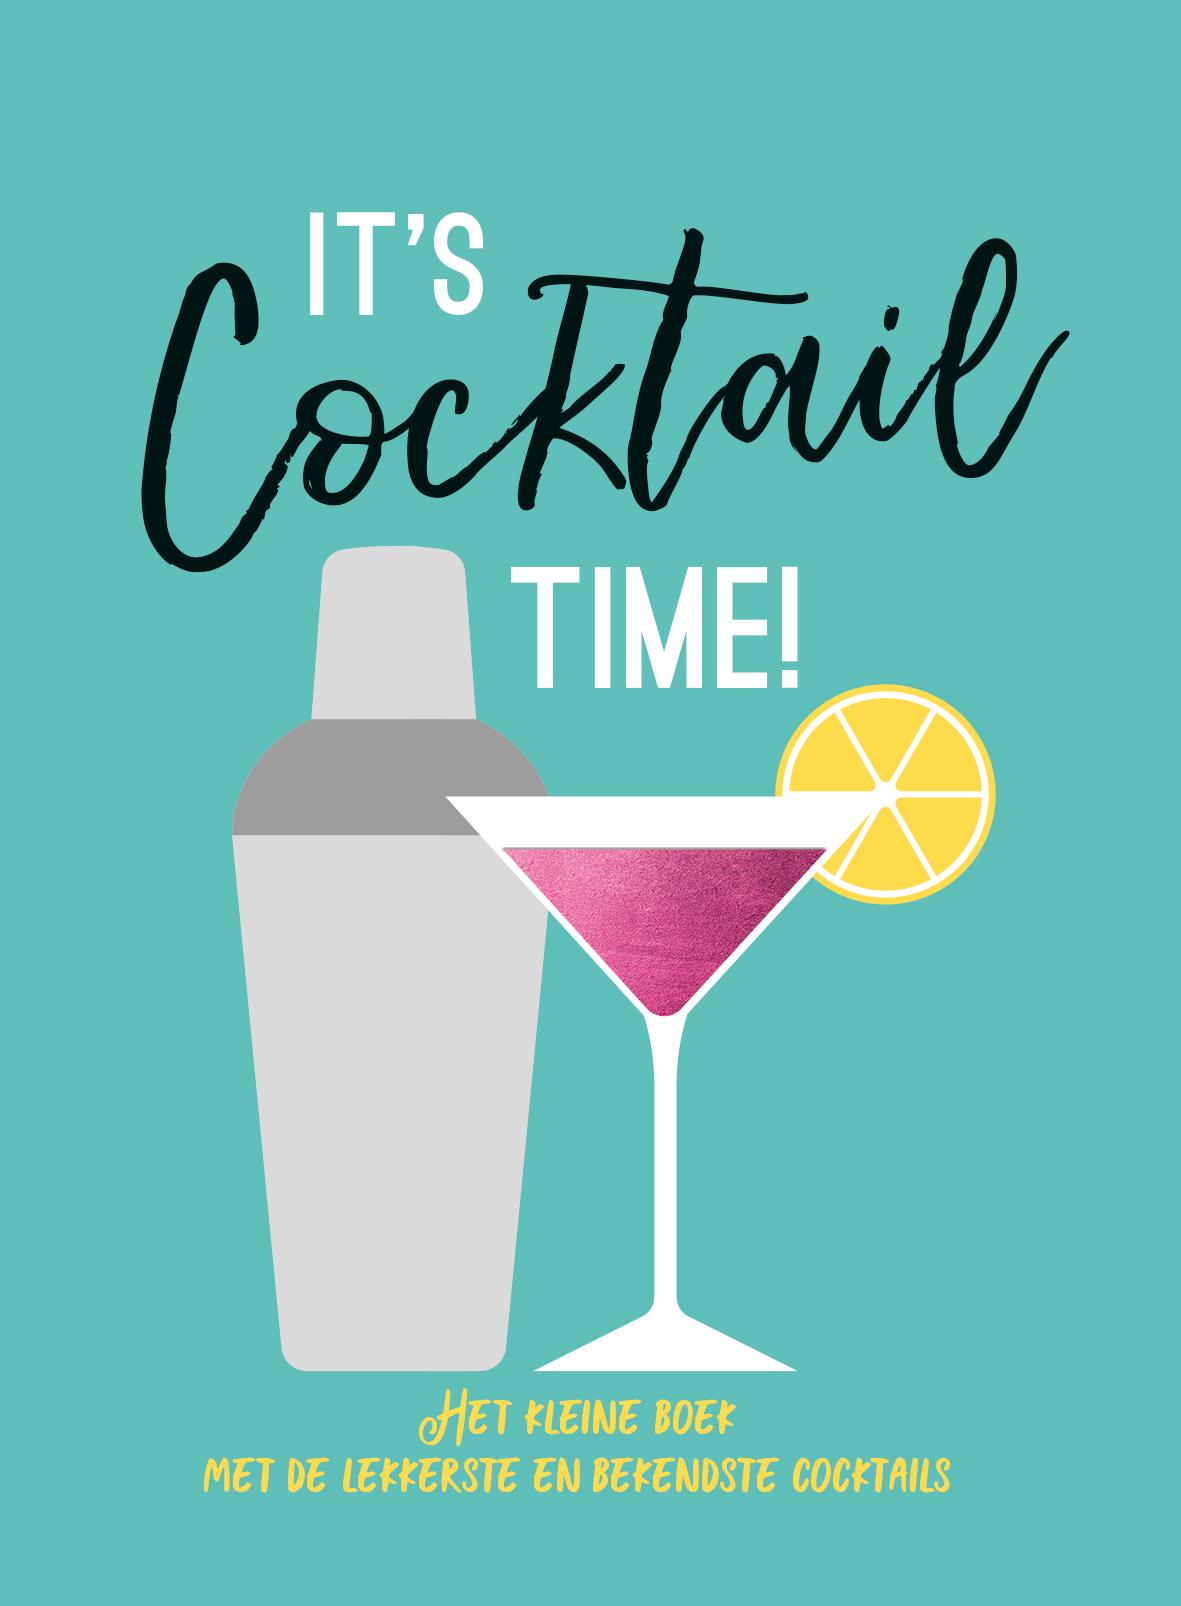 It's cocktail time - Cadeauboeken